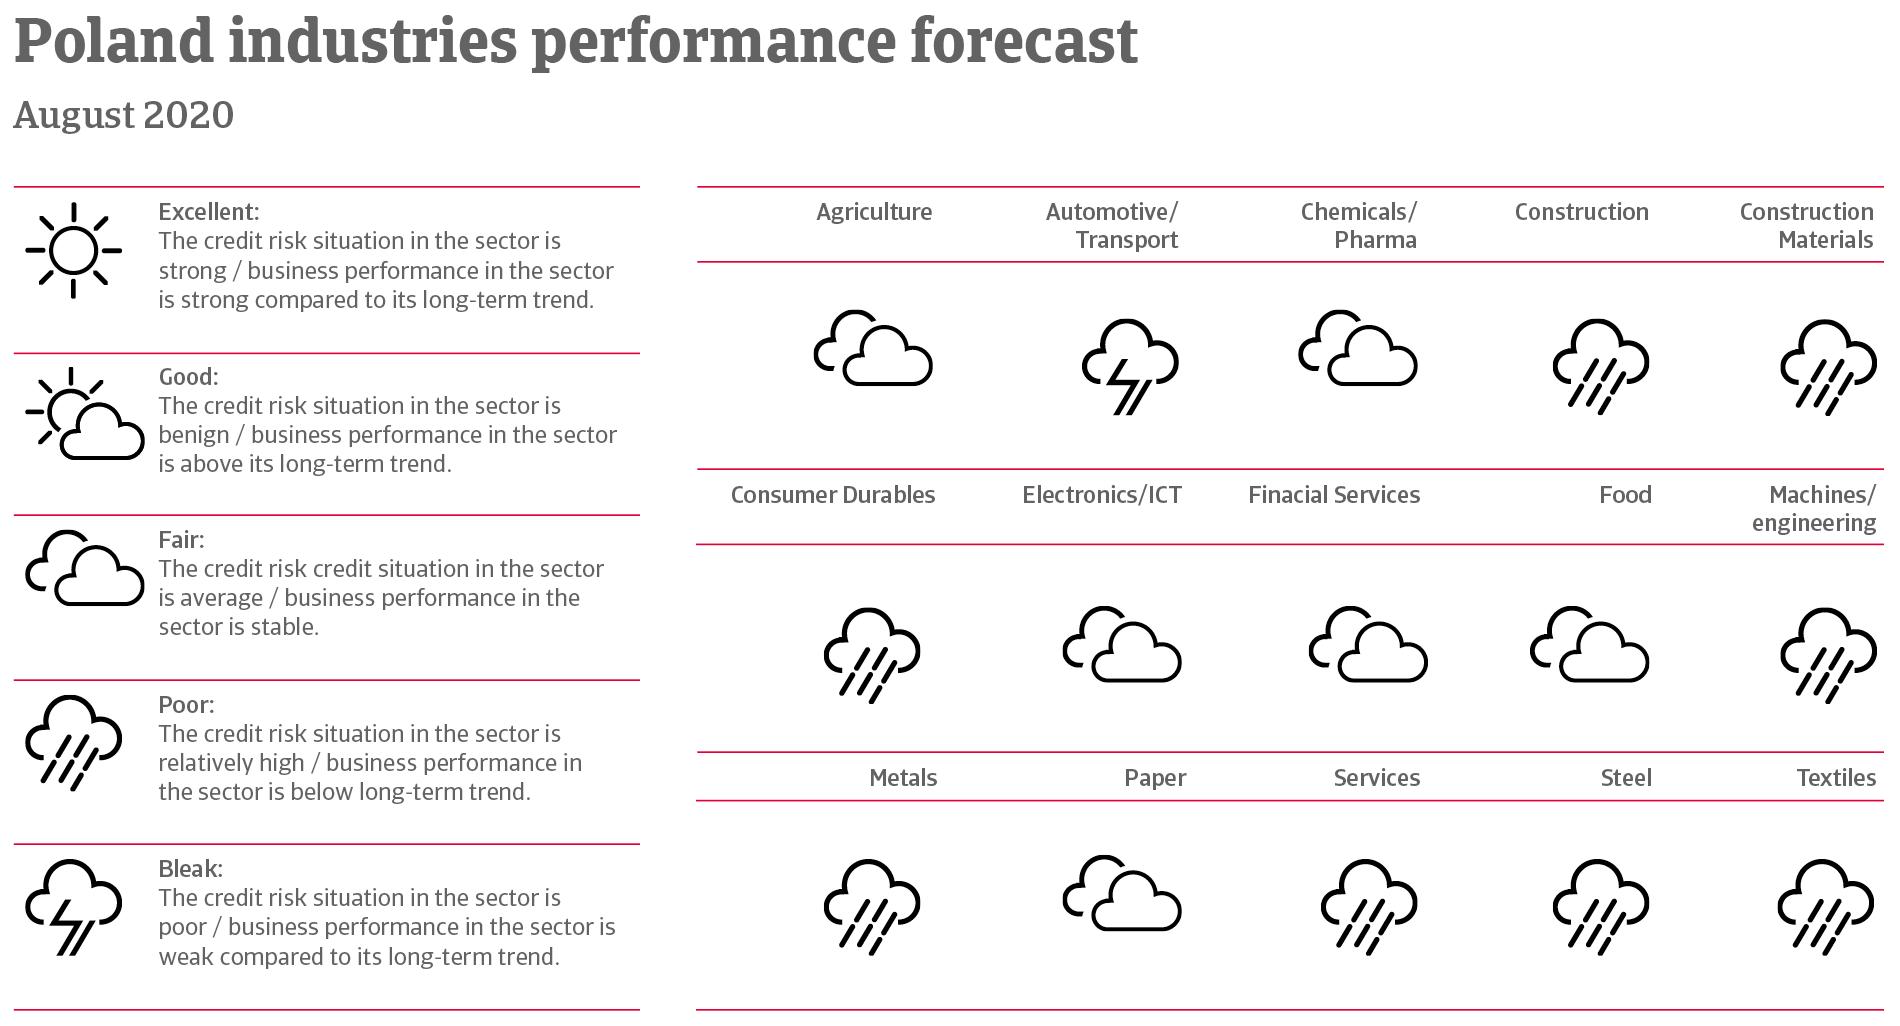 Performance forecast of Polish industries